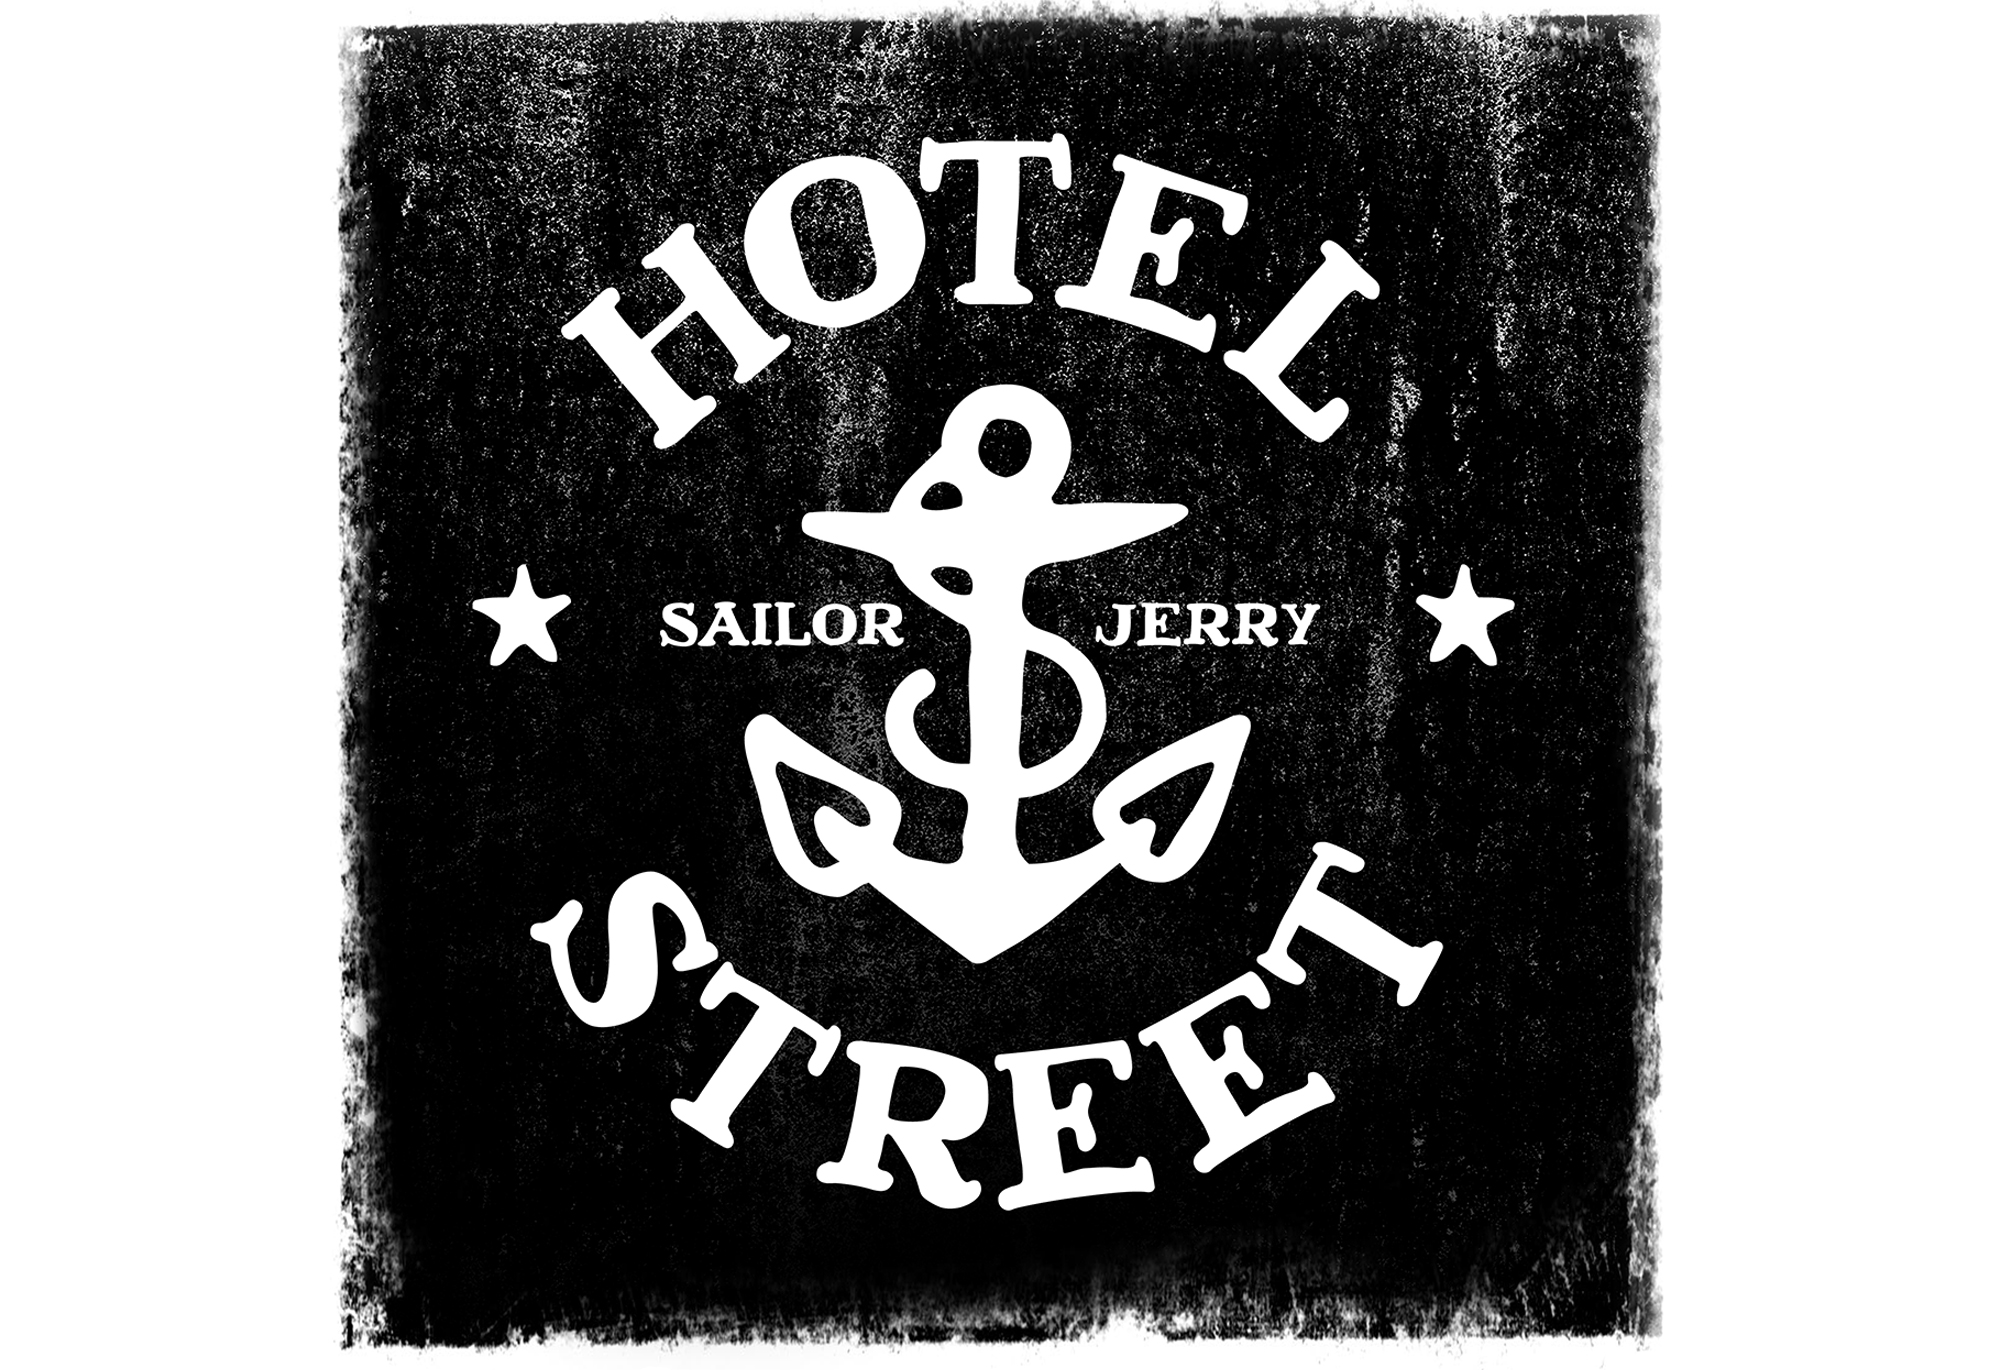 Sailor Jerry Hotel Street logo